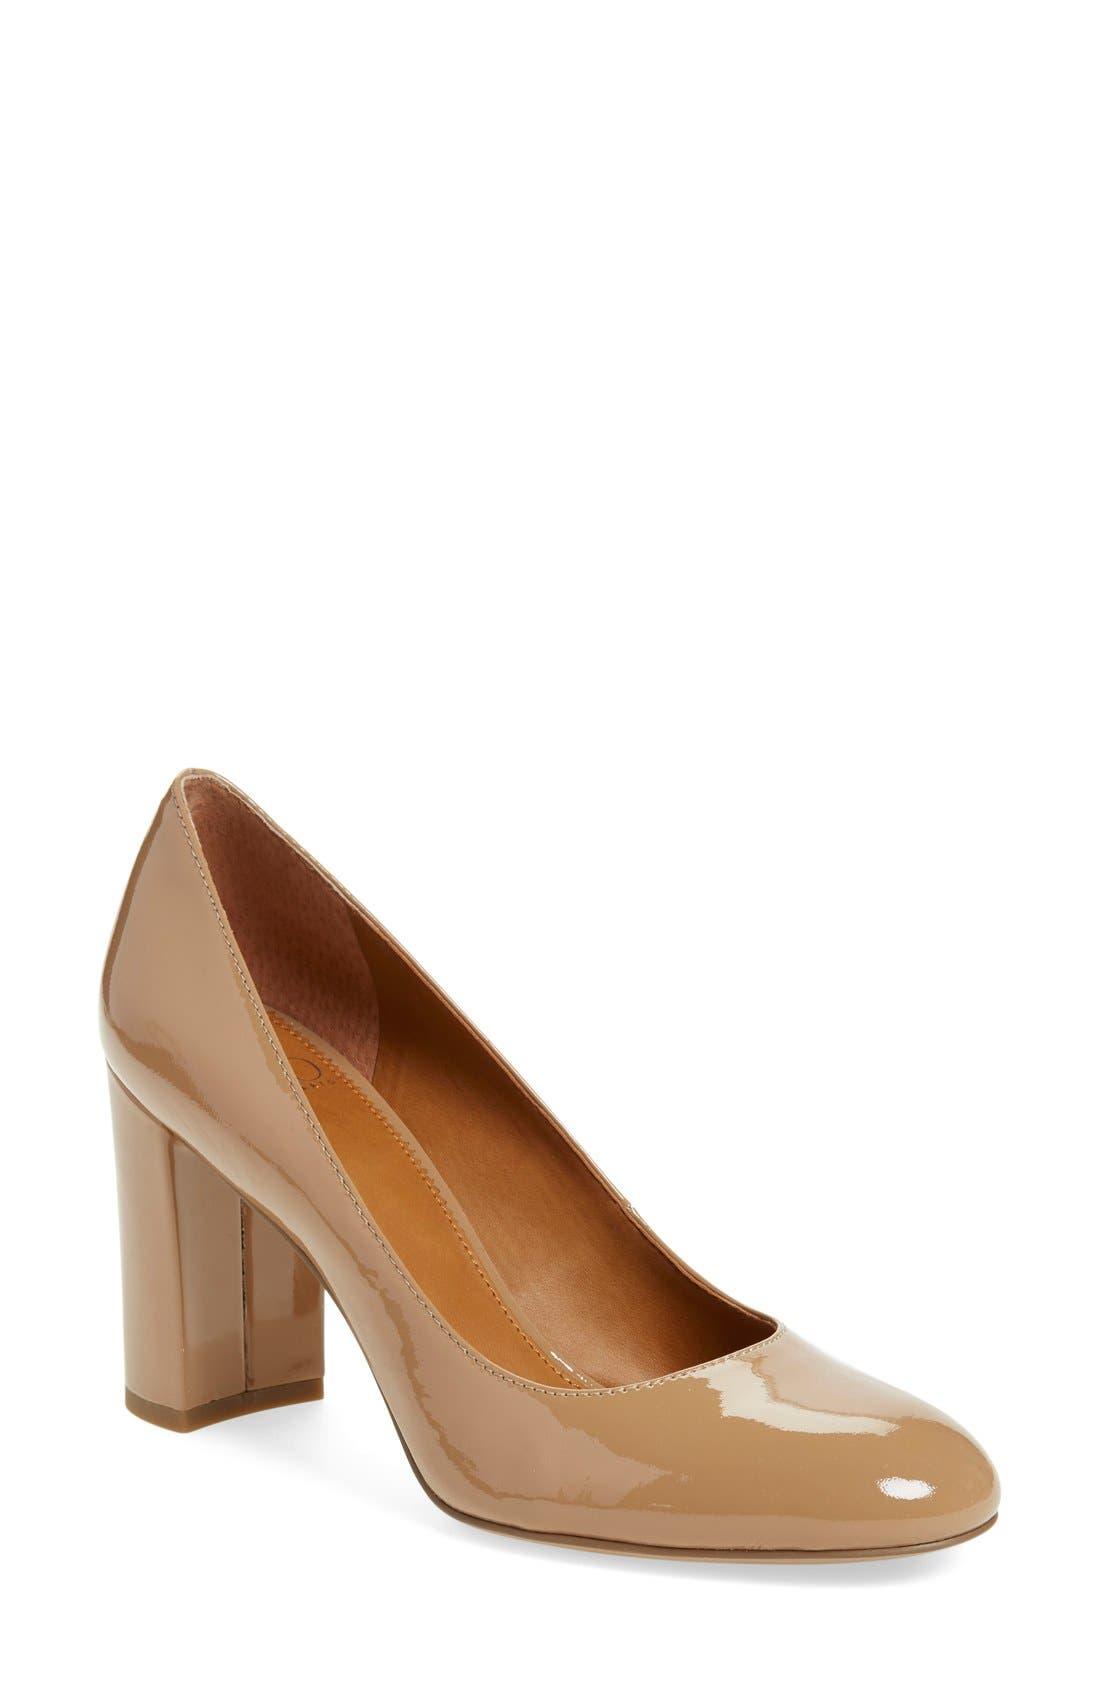 Main Image - SARTO by Franco Sarto Aziza Block Heel Pump (Women)